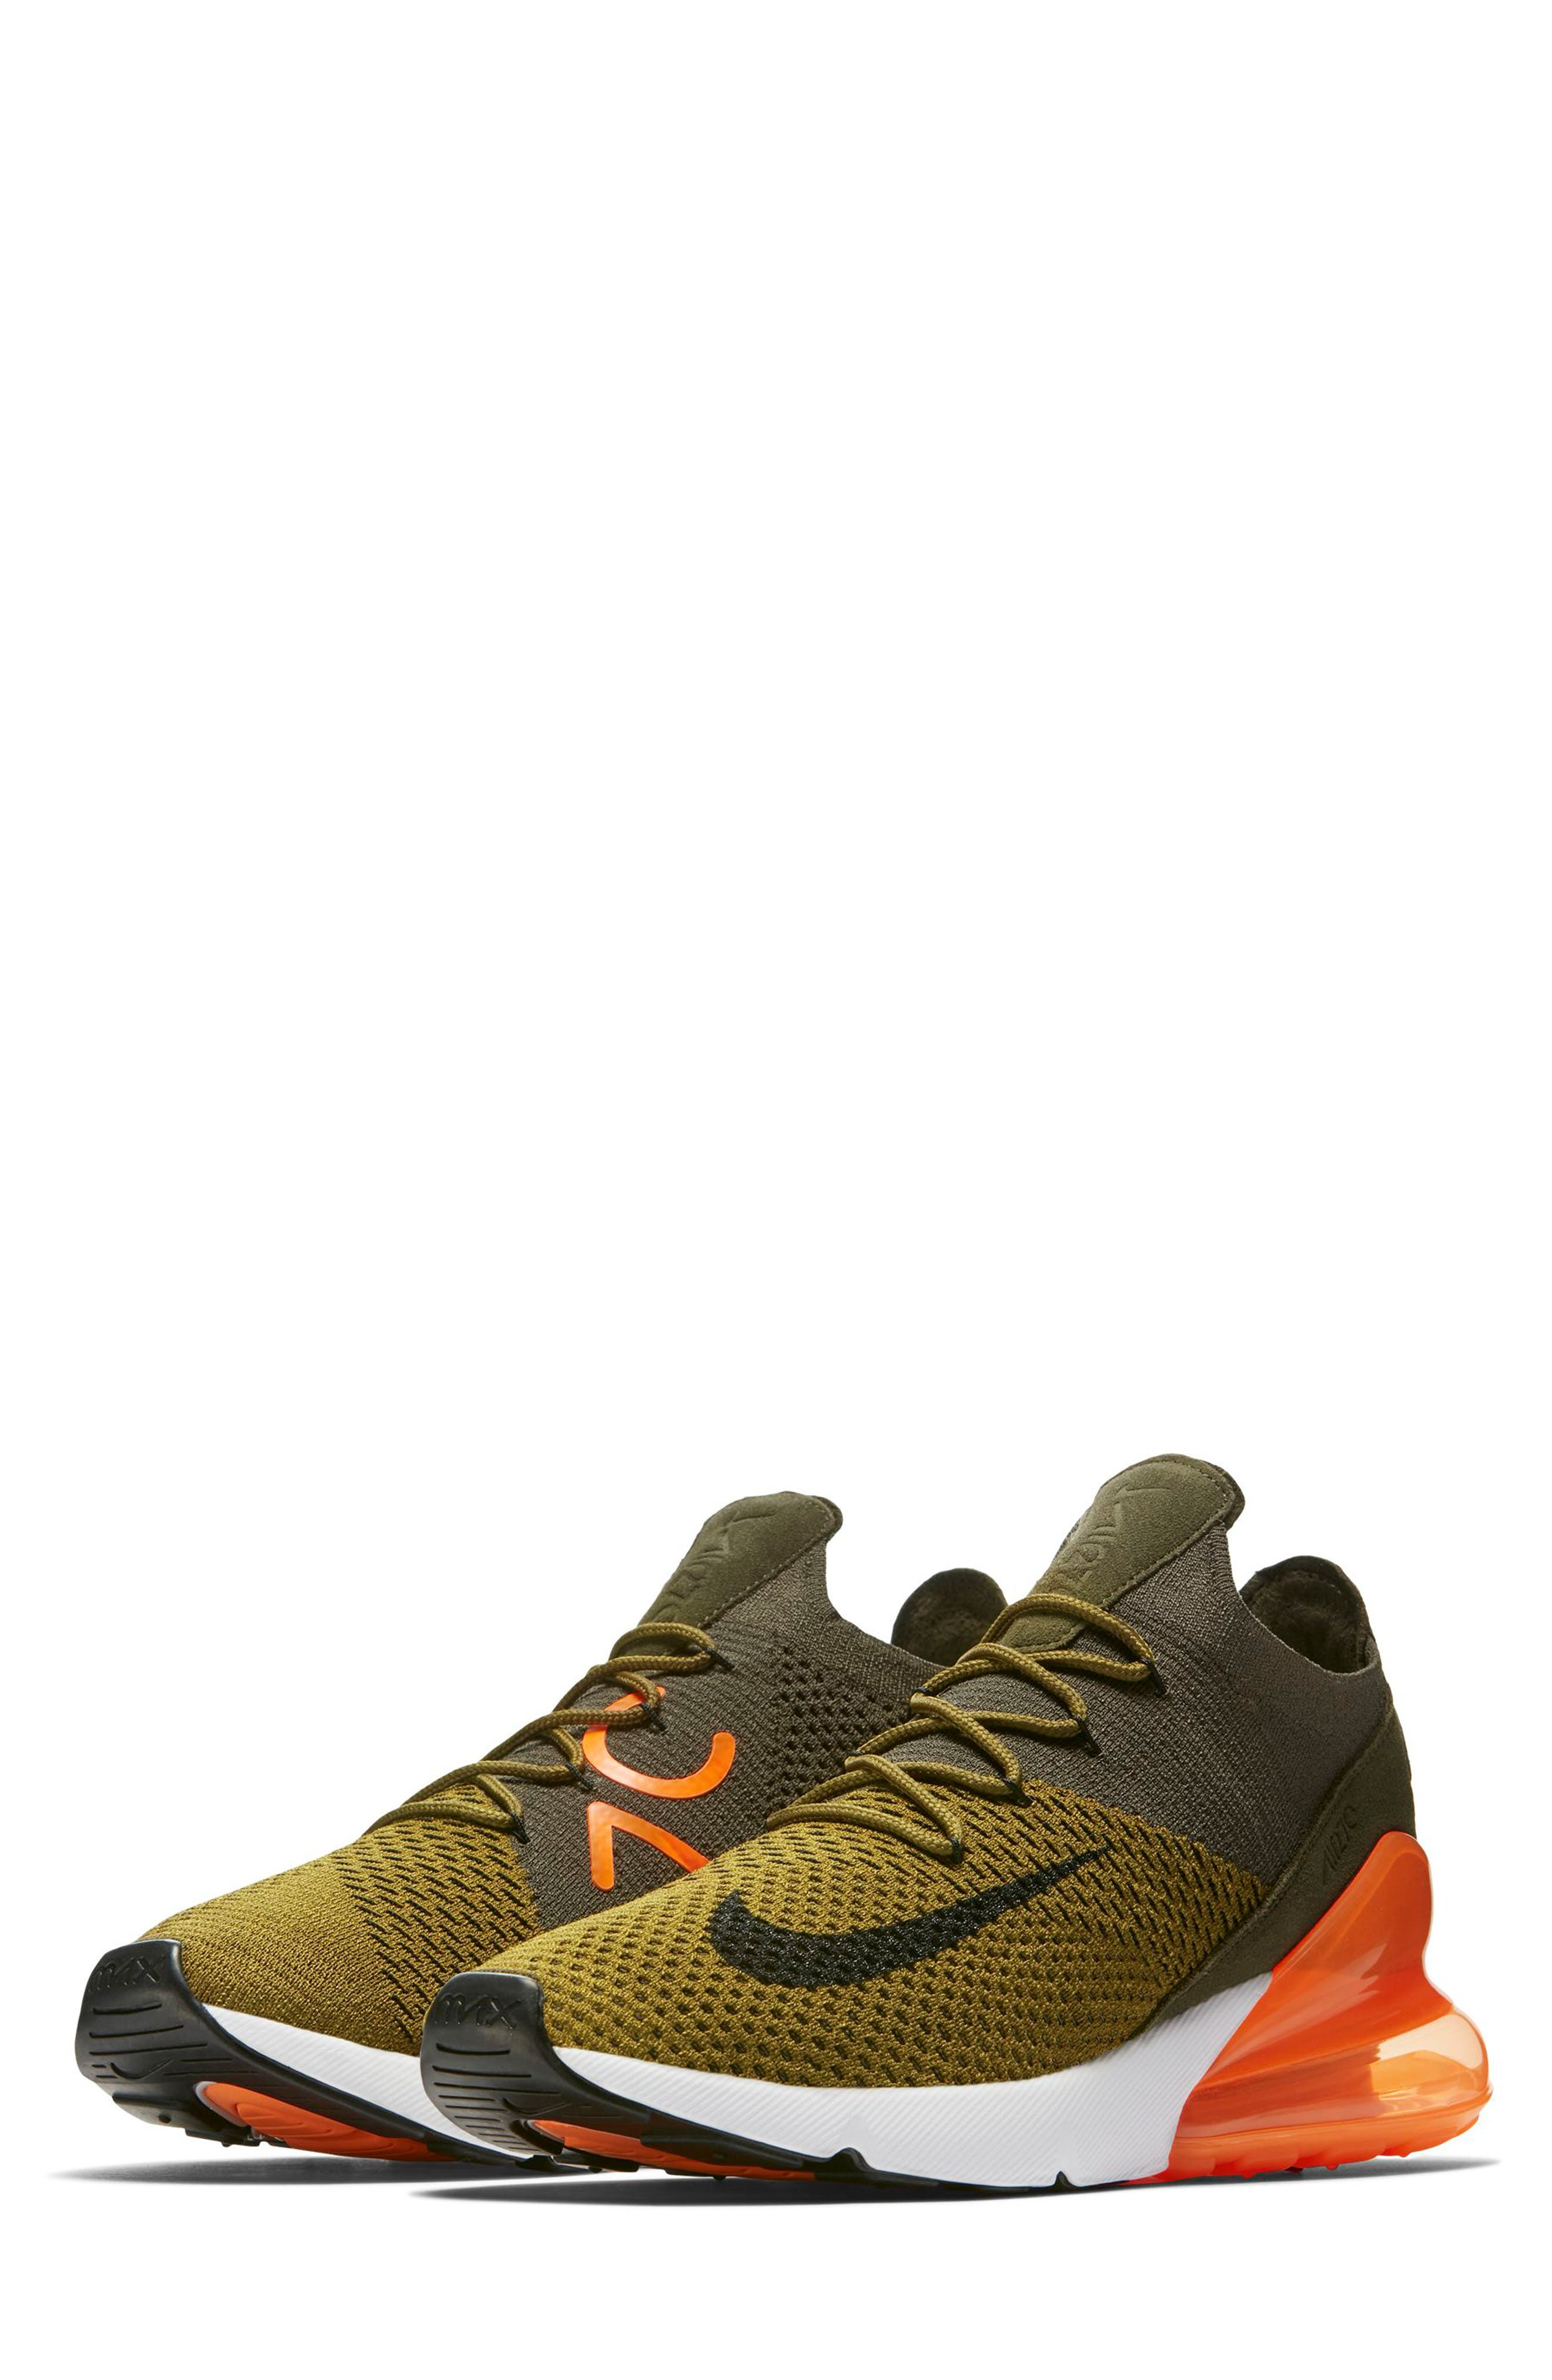 Air Max 270 Flyknit Sneaker,                         Main,                         color, OLIVE/ BLACK/ CARGO KHAKI